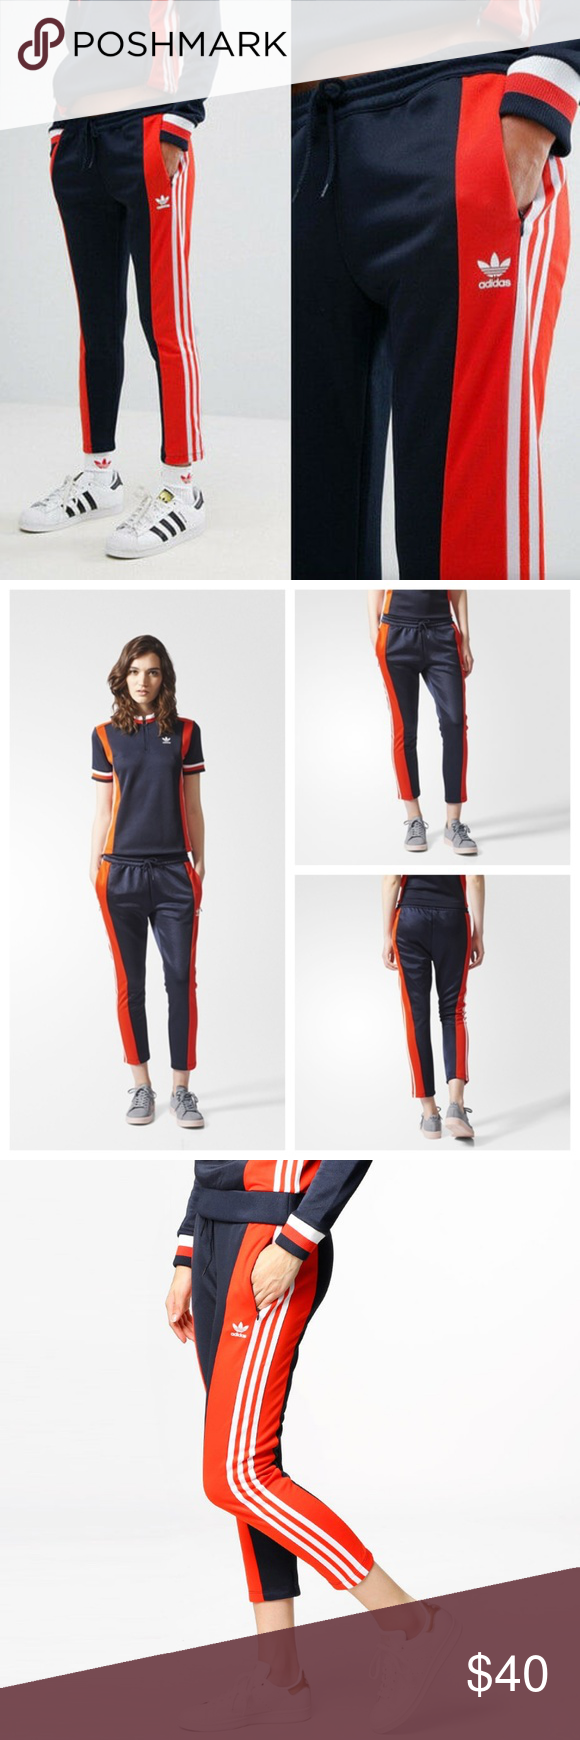 Adidas Originals Womens Osaka AR TP Track Pants BQ5753